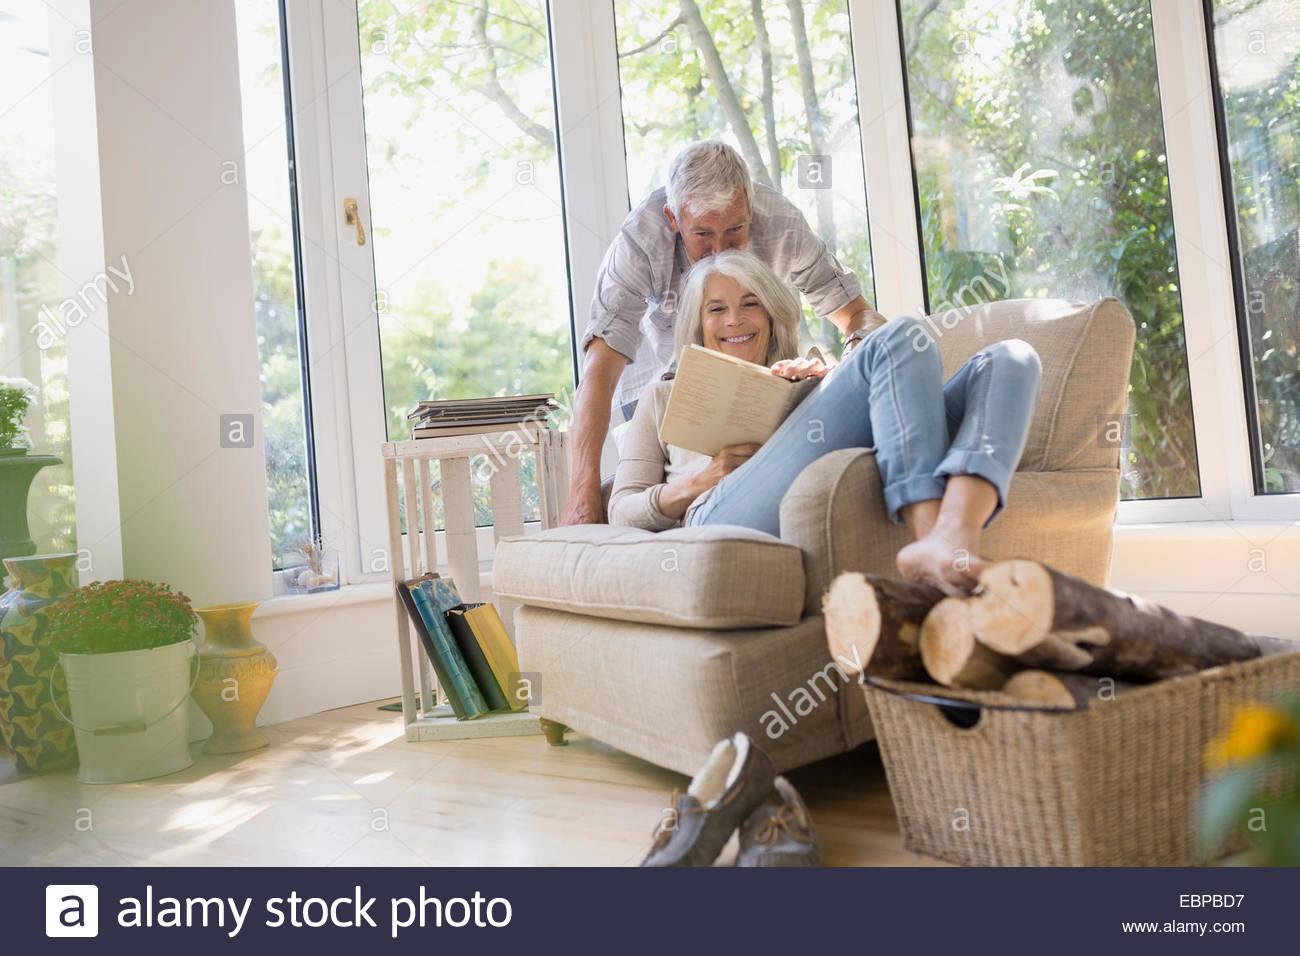 Senior couple reading book in armchair Photo Stock